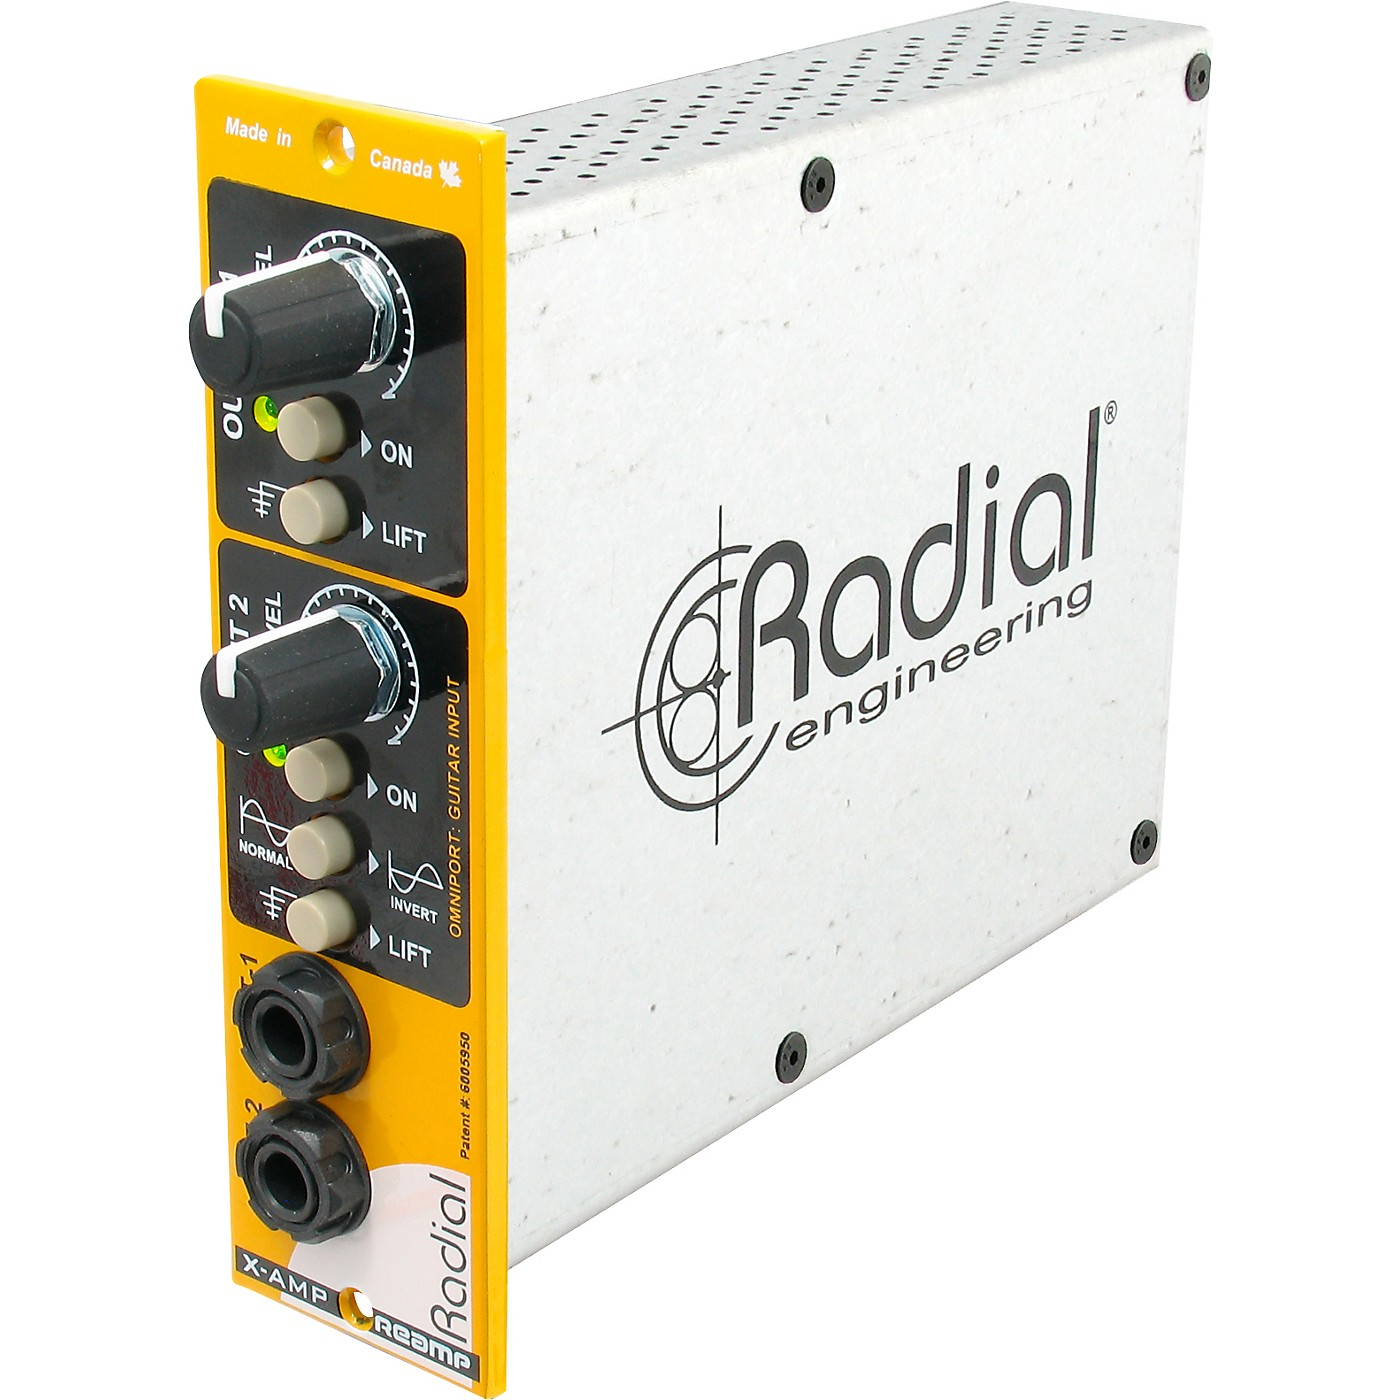 Radial Engineering X-Amp 500 Reamp thumbnail